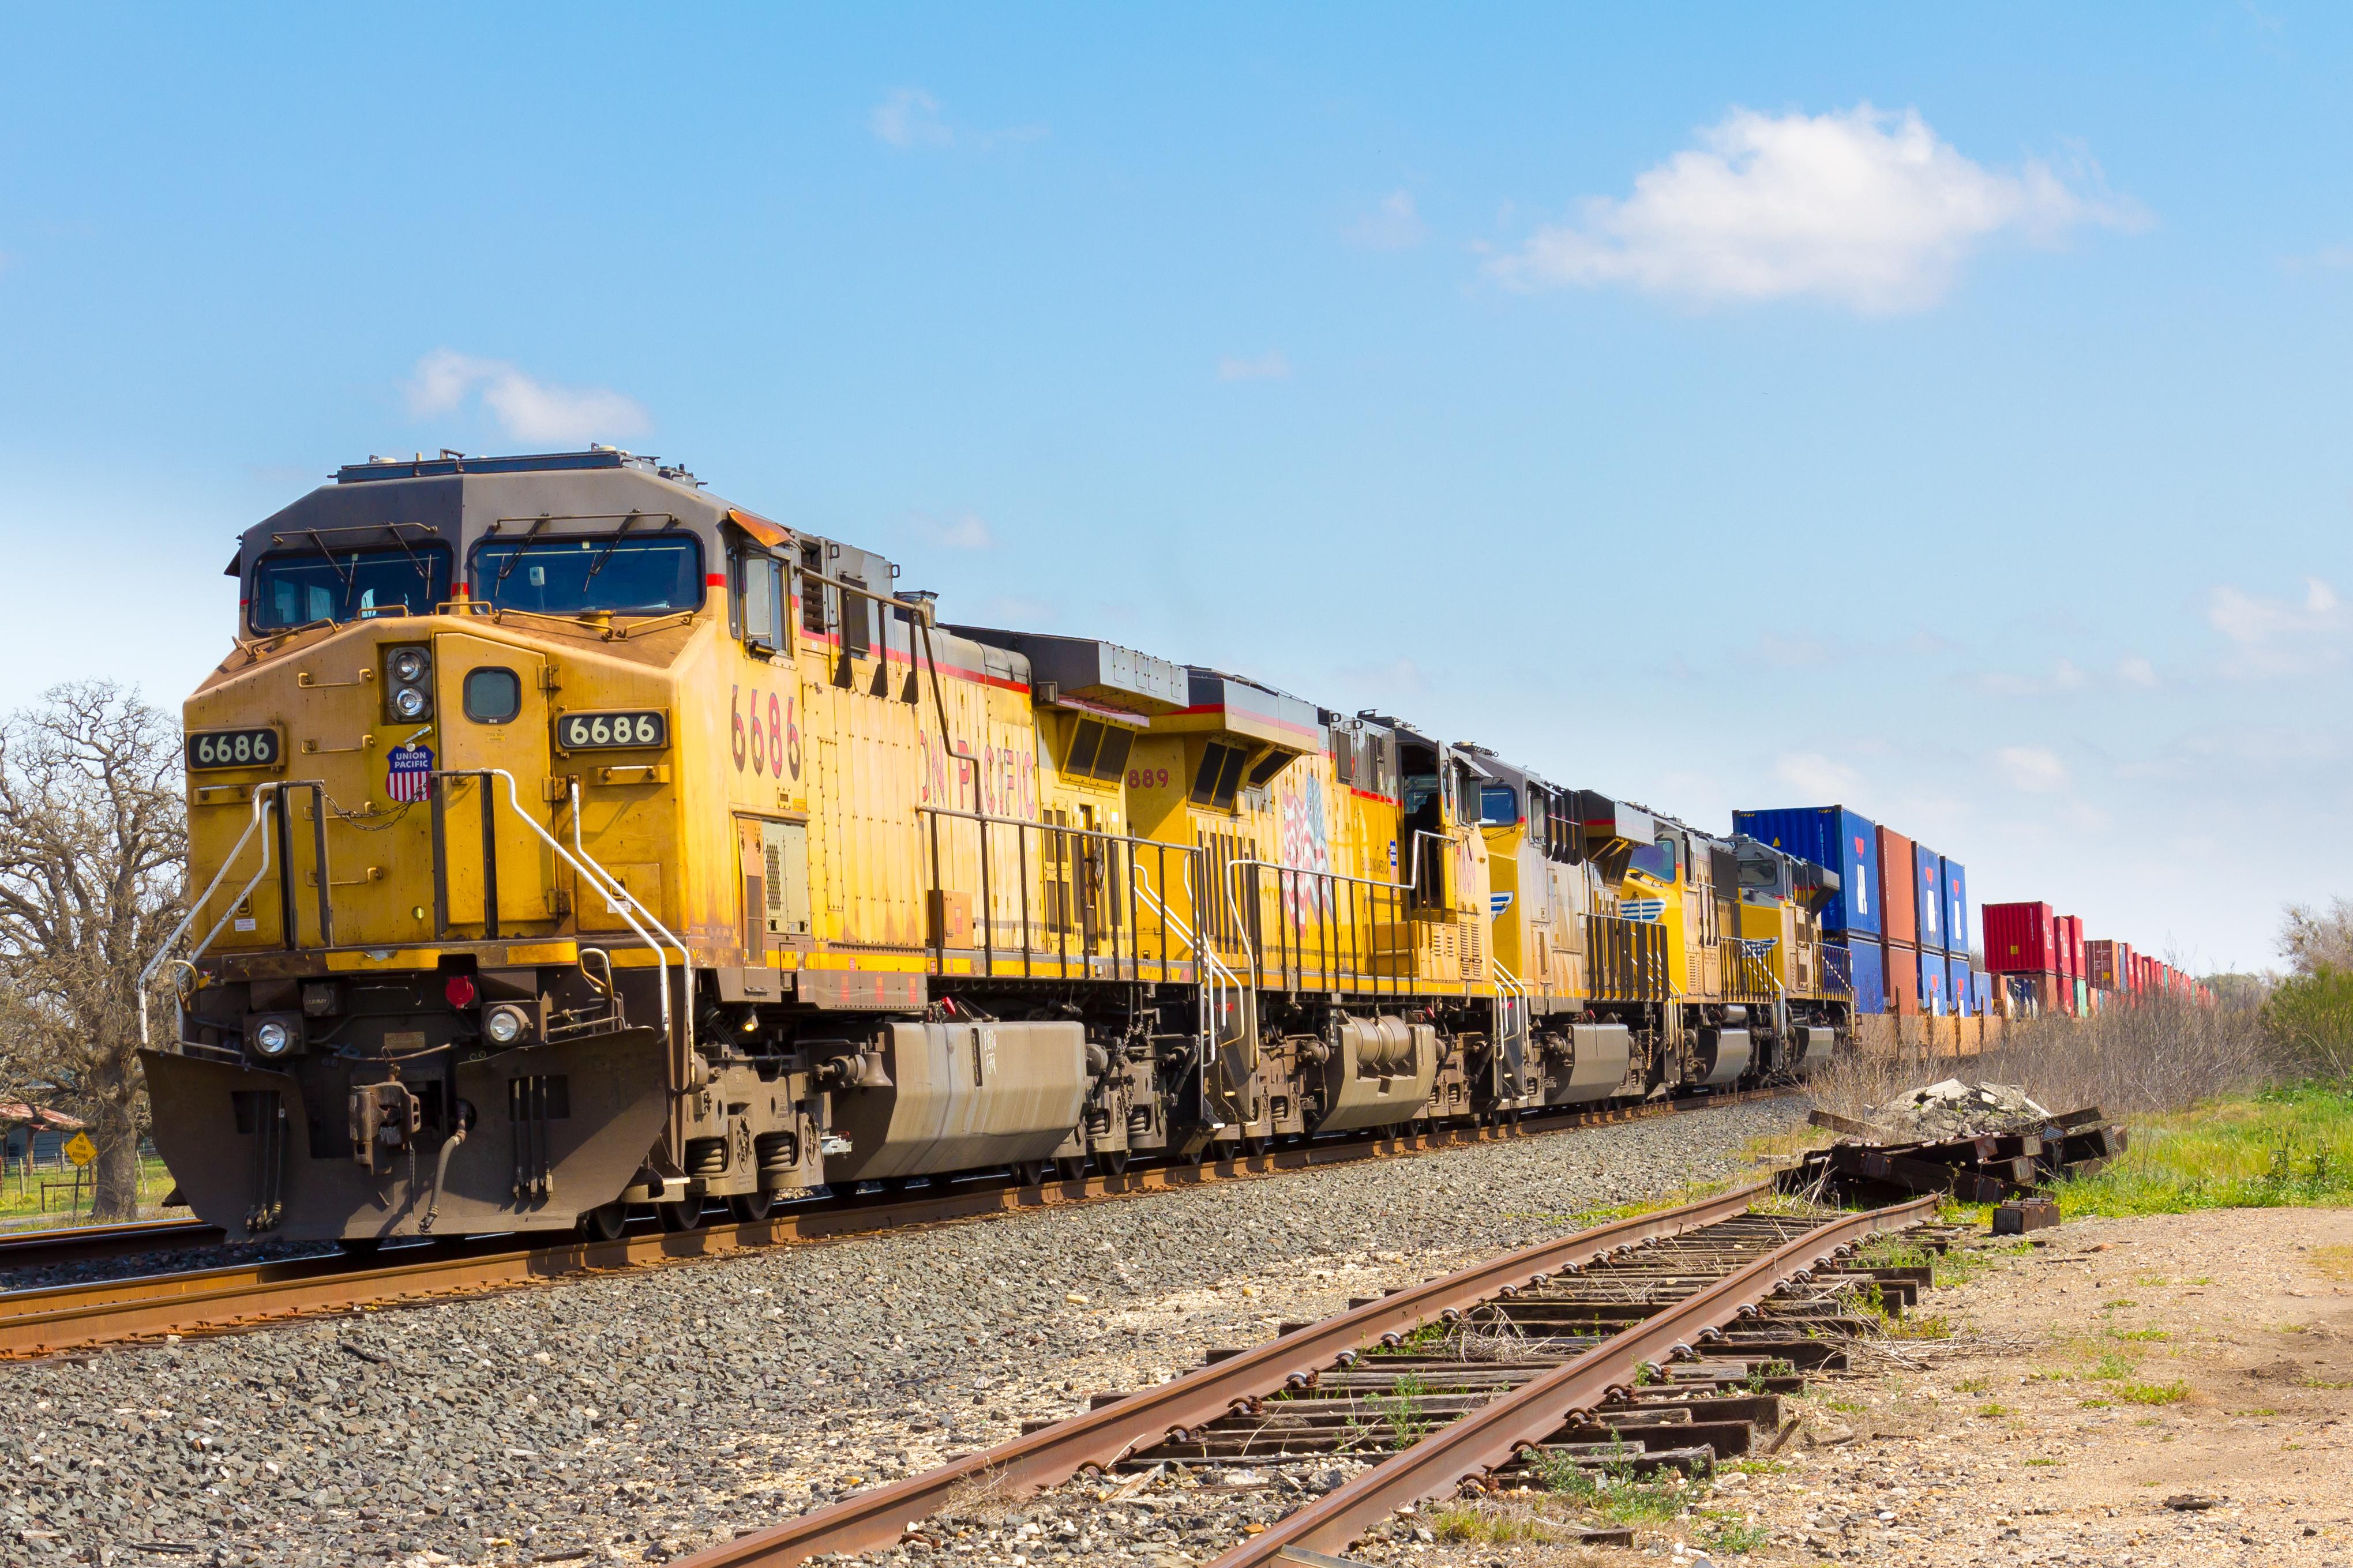 Railroad News: US intermodal rail fluidity improves, but